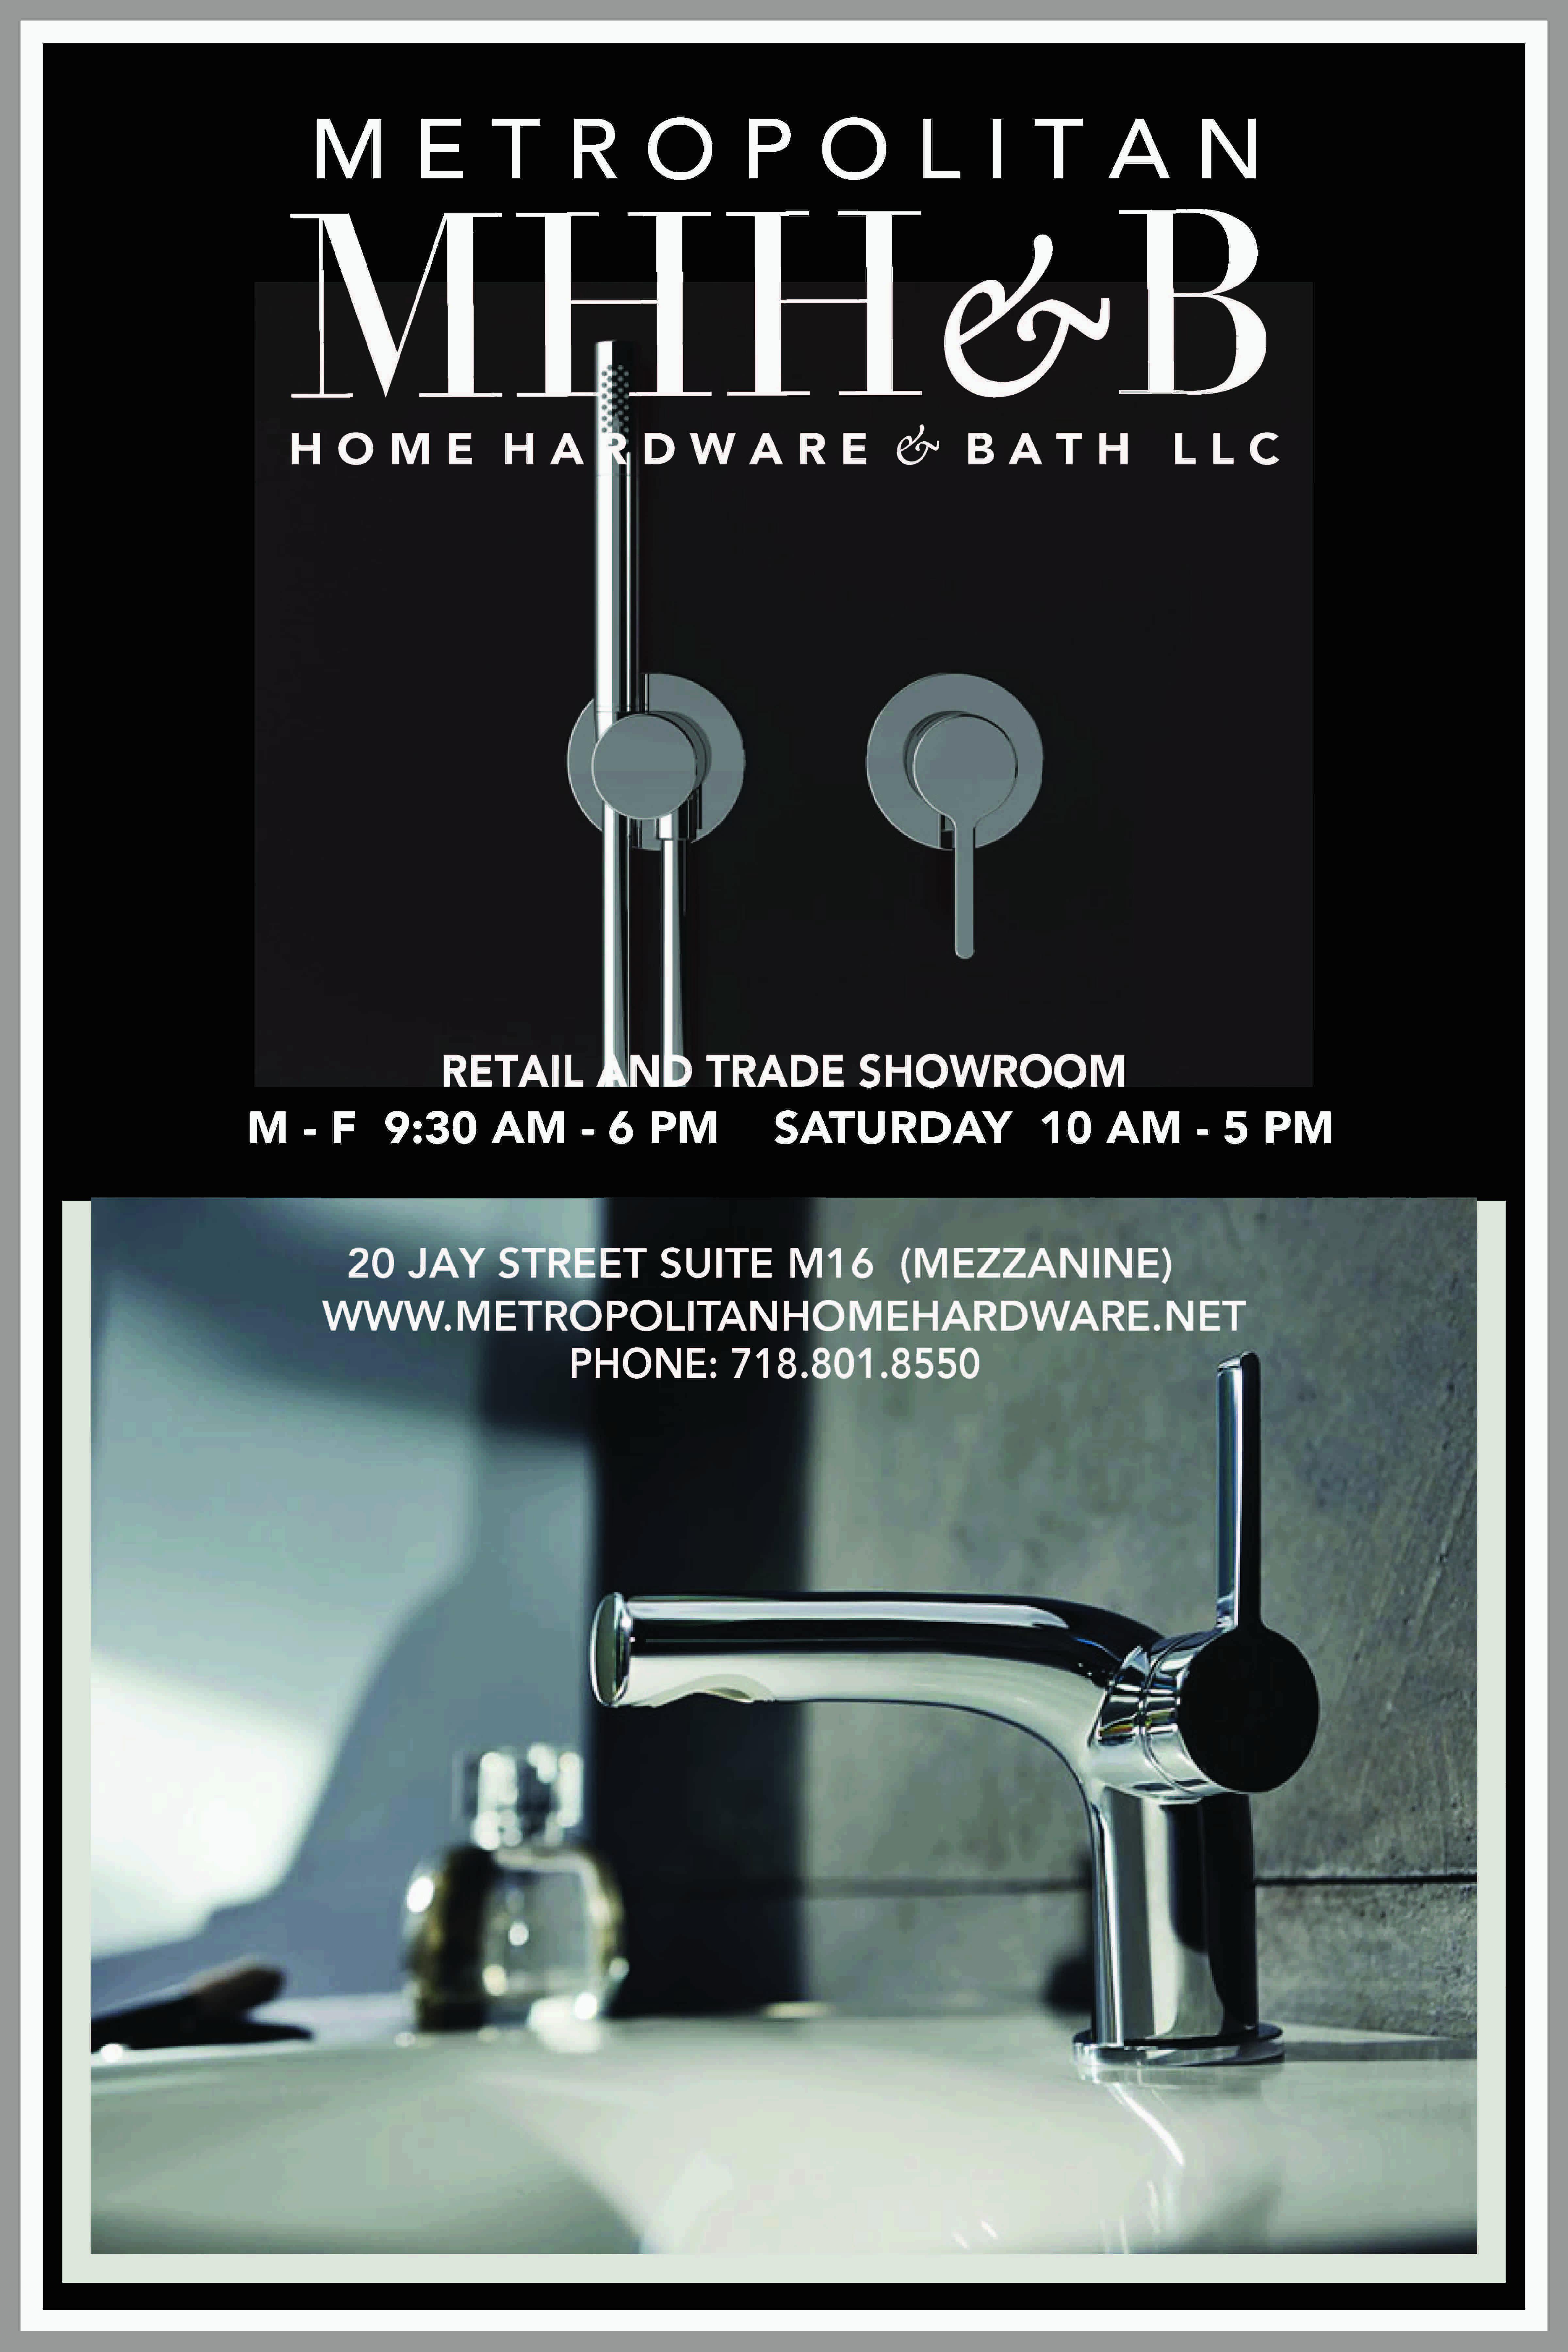 Metropolitan Home Hardware & Bath LLC Dumbo-9